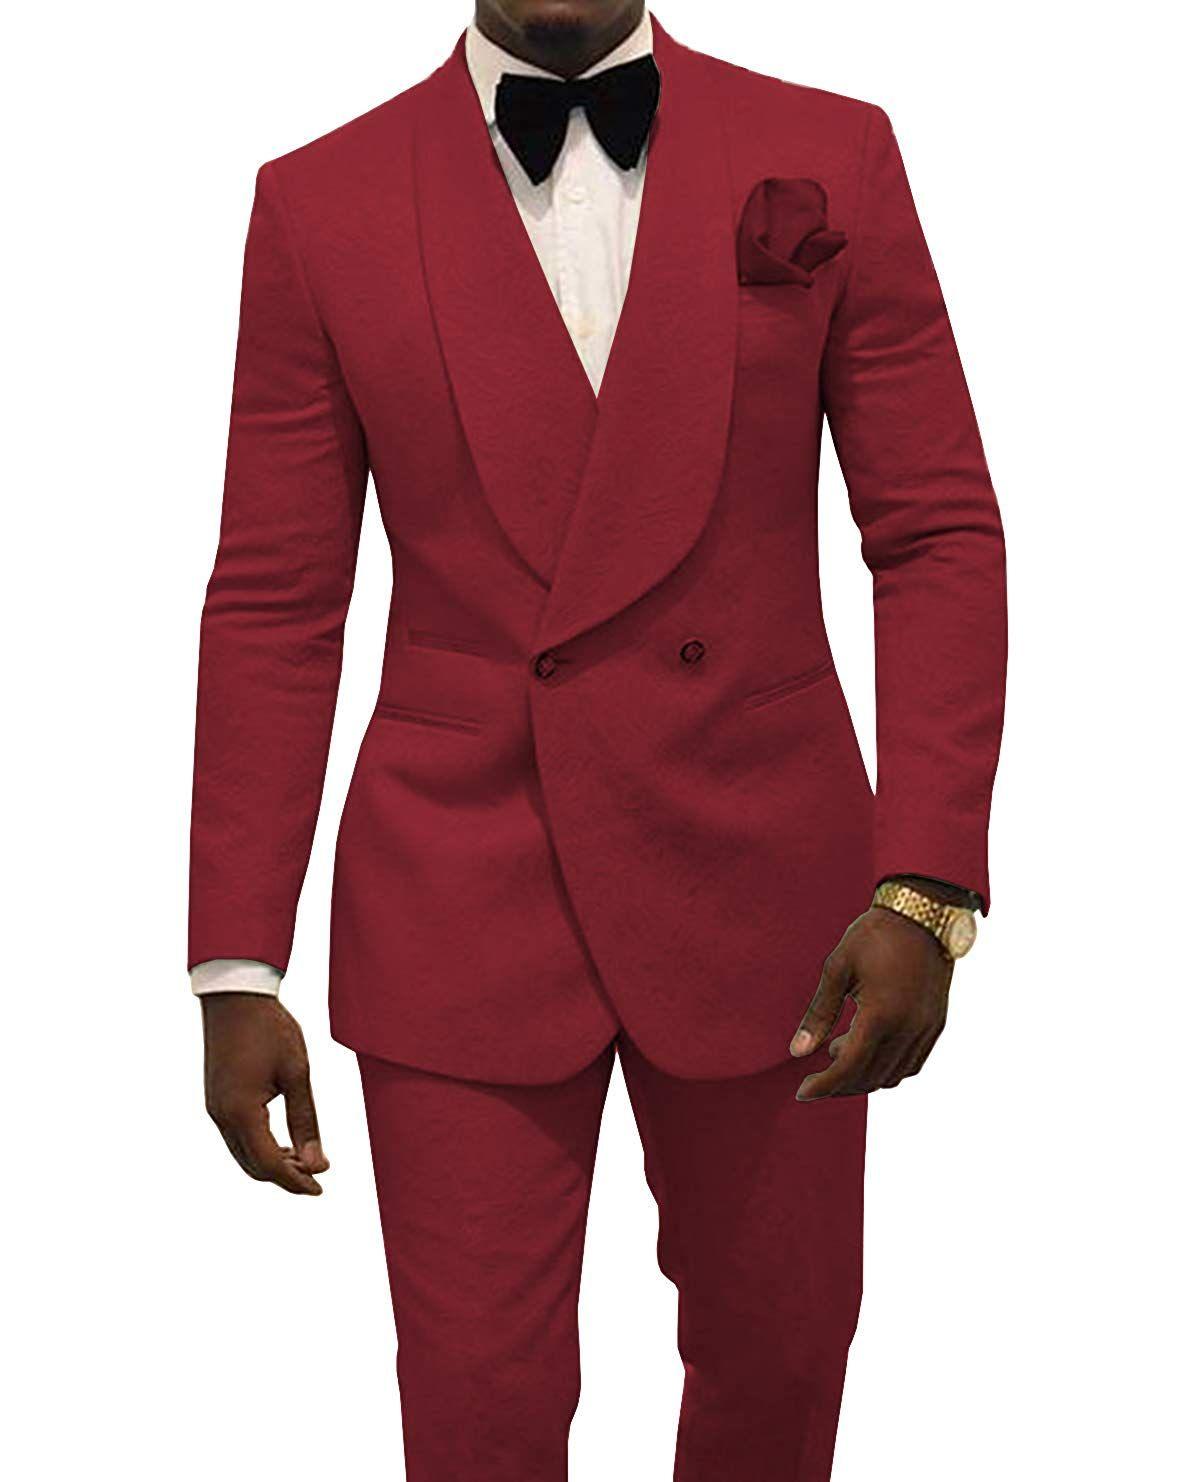 2021 scialle risvolto smoking smoking sposo usura vestiti Borgogna Groomsmen Slim Fit Formale Dinner Abiti da uomo Abiti da uomo (giacca + pantaloni + prua)